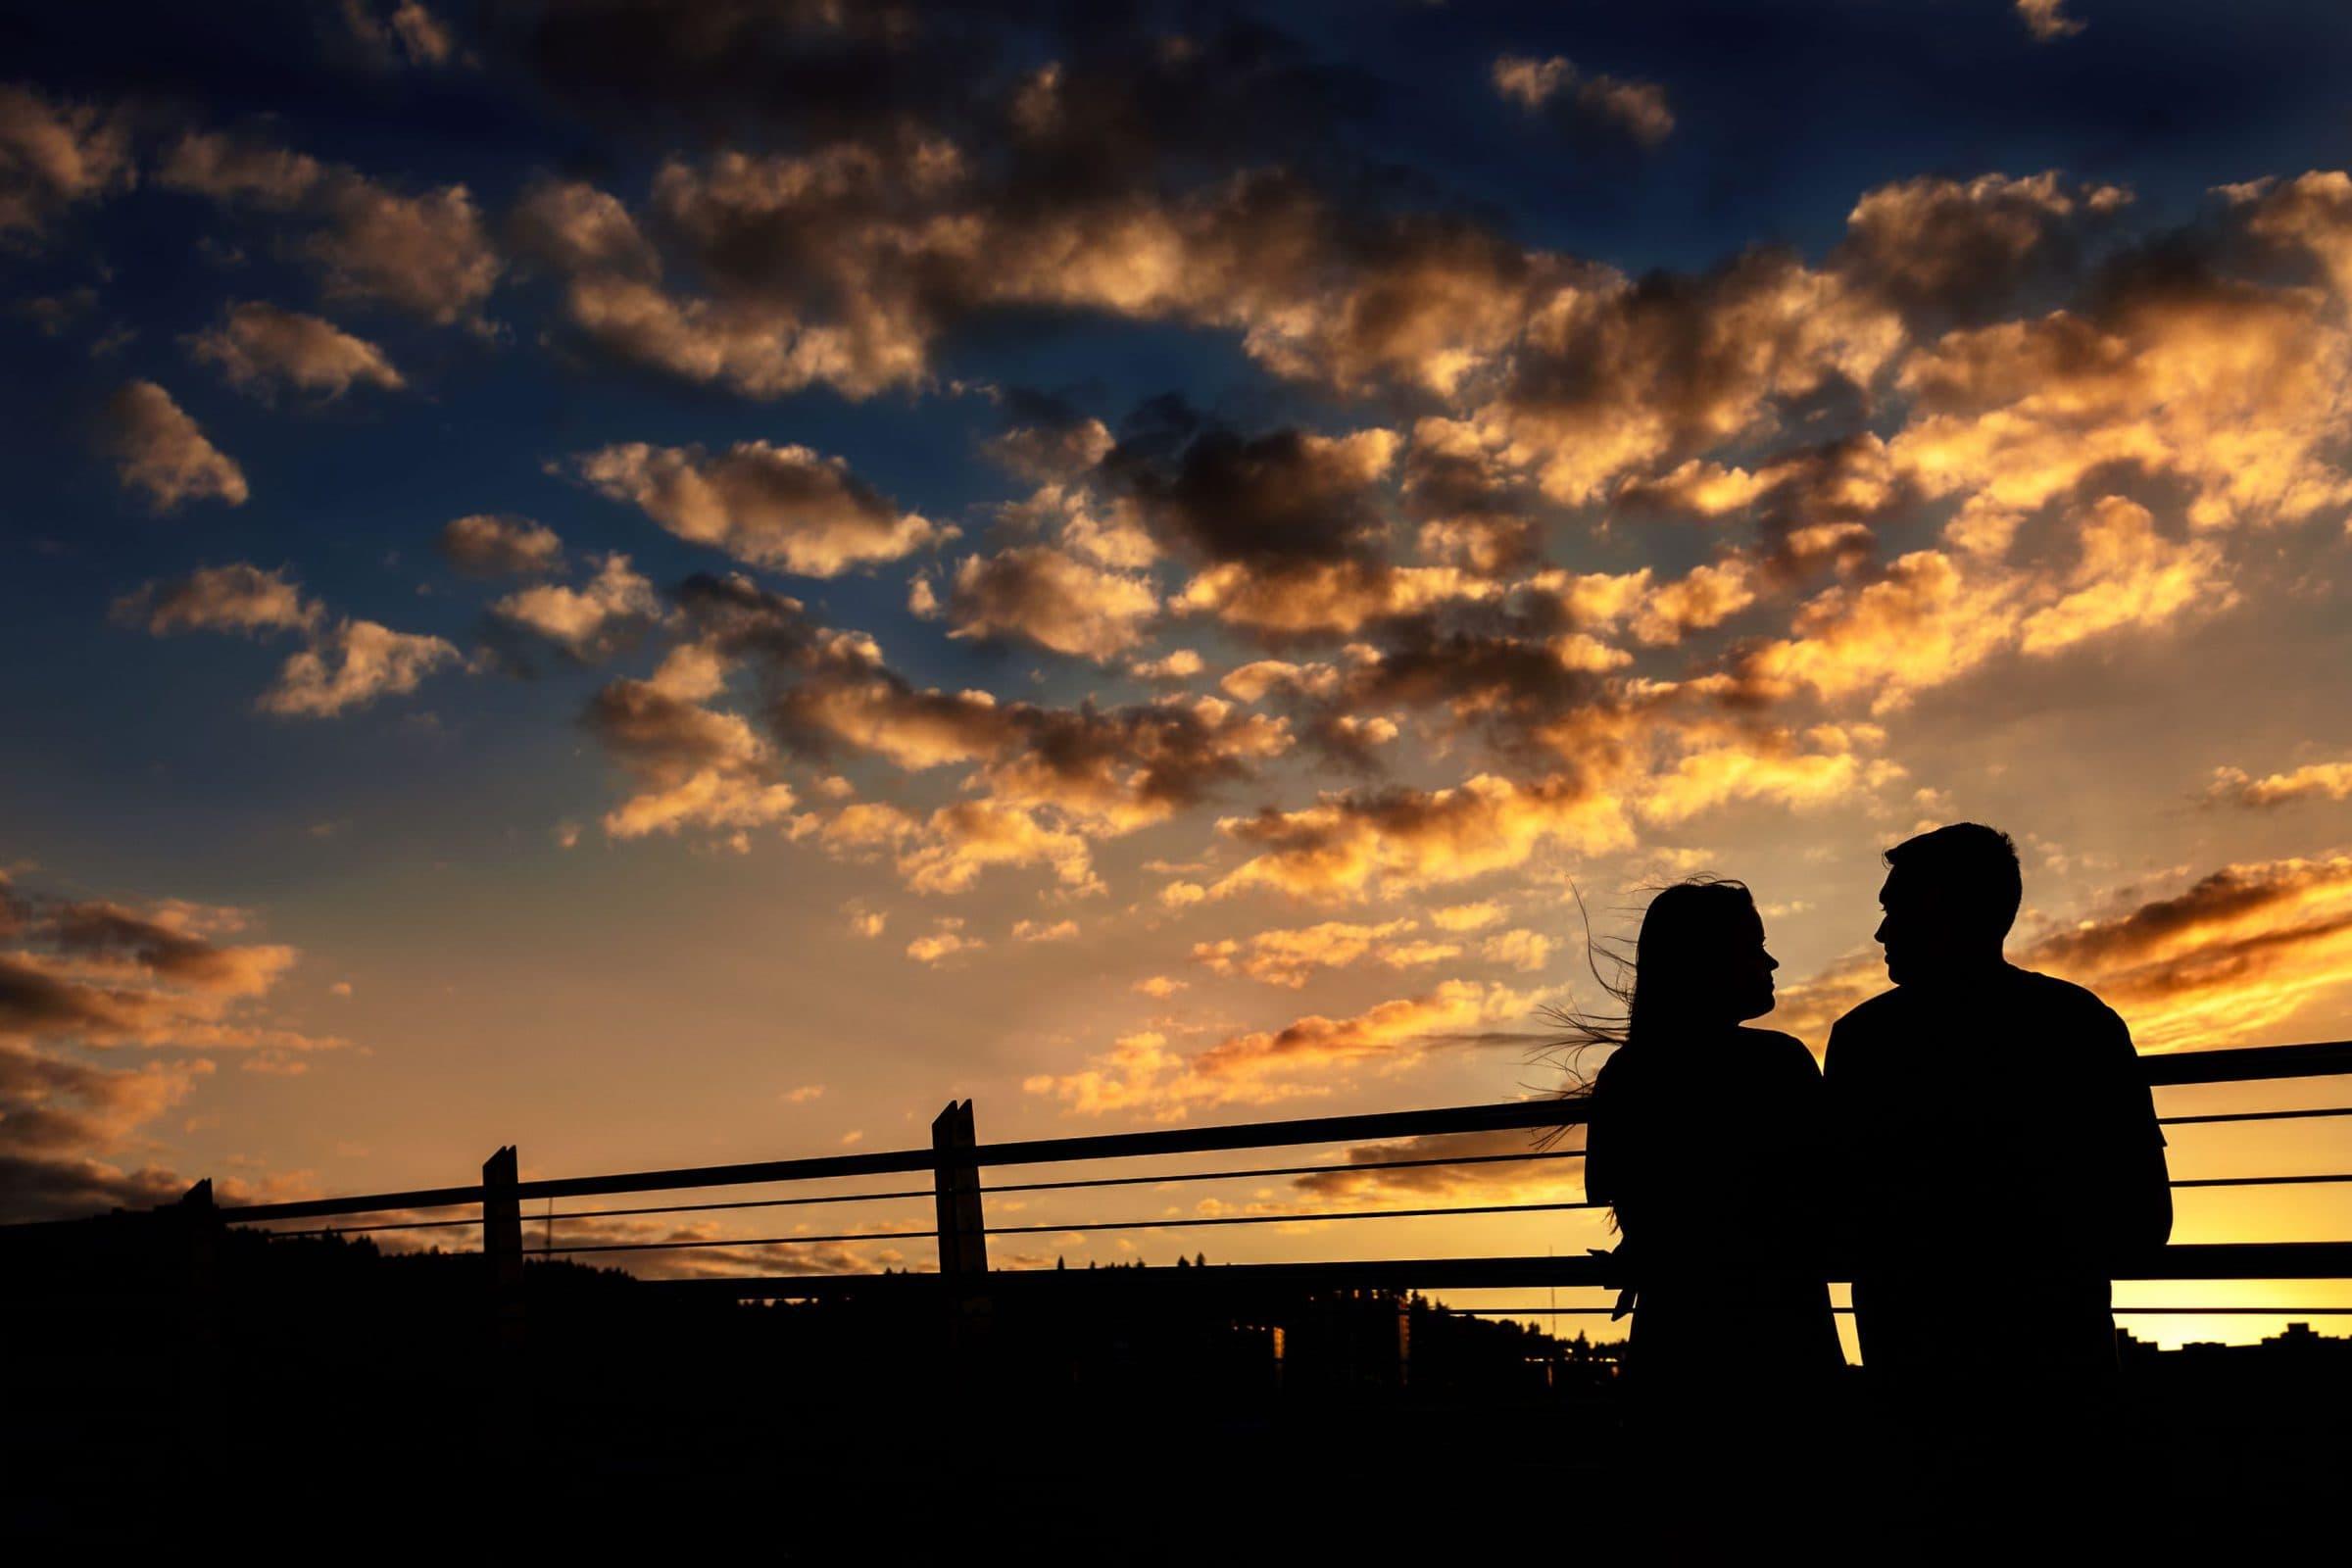 A beautiful sunset moment for a couple during their Tilikum Bridge engagement photos